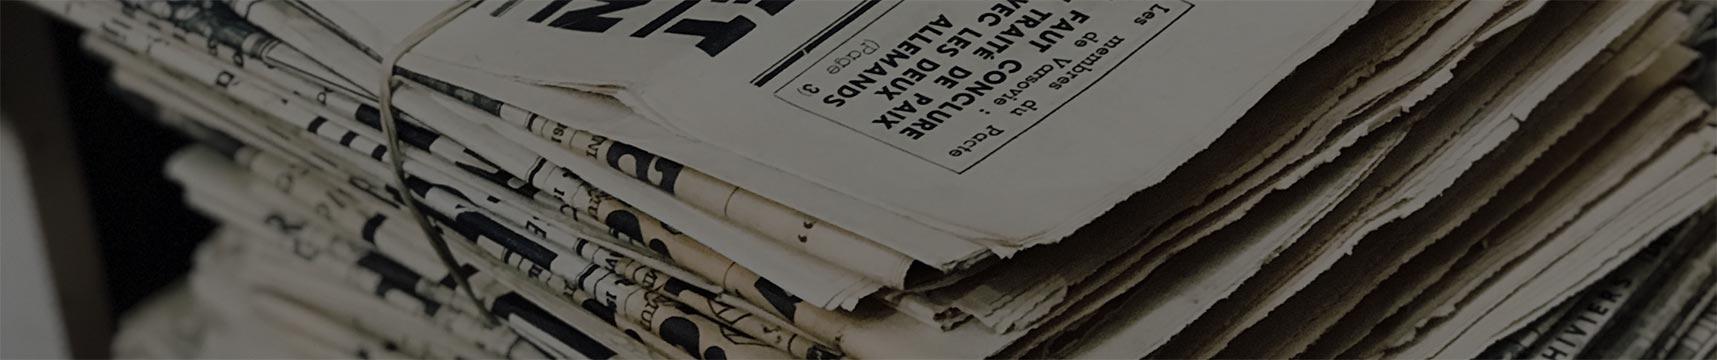 The HR Strategist: <br> Your HR News Outlet